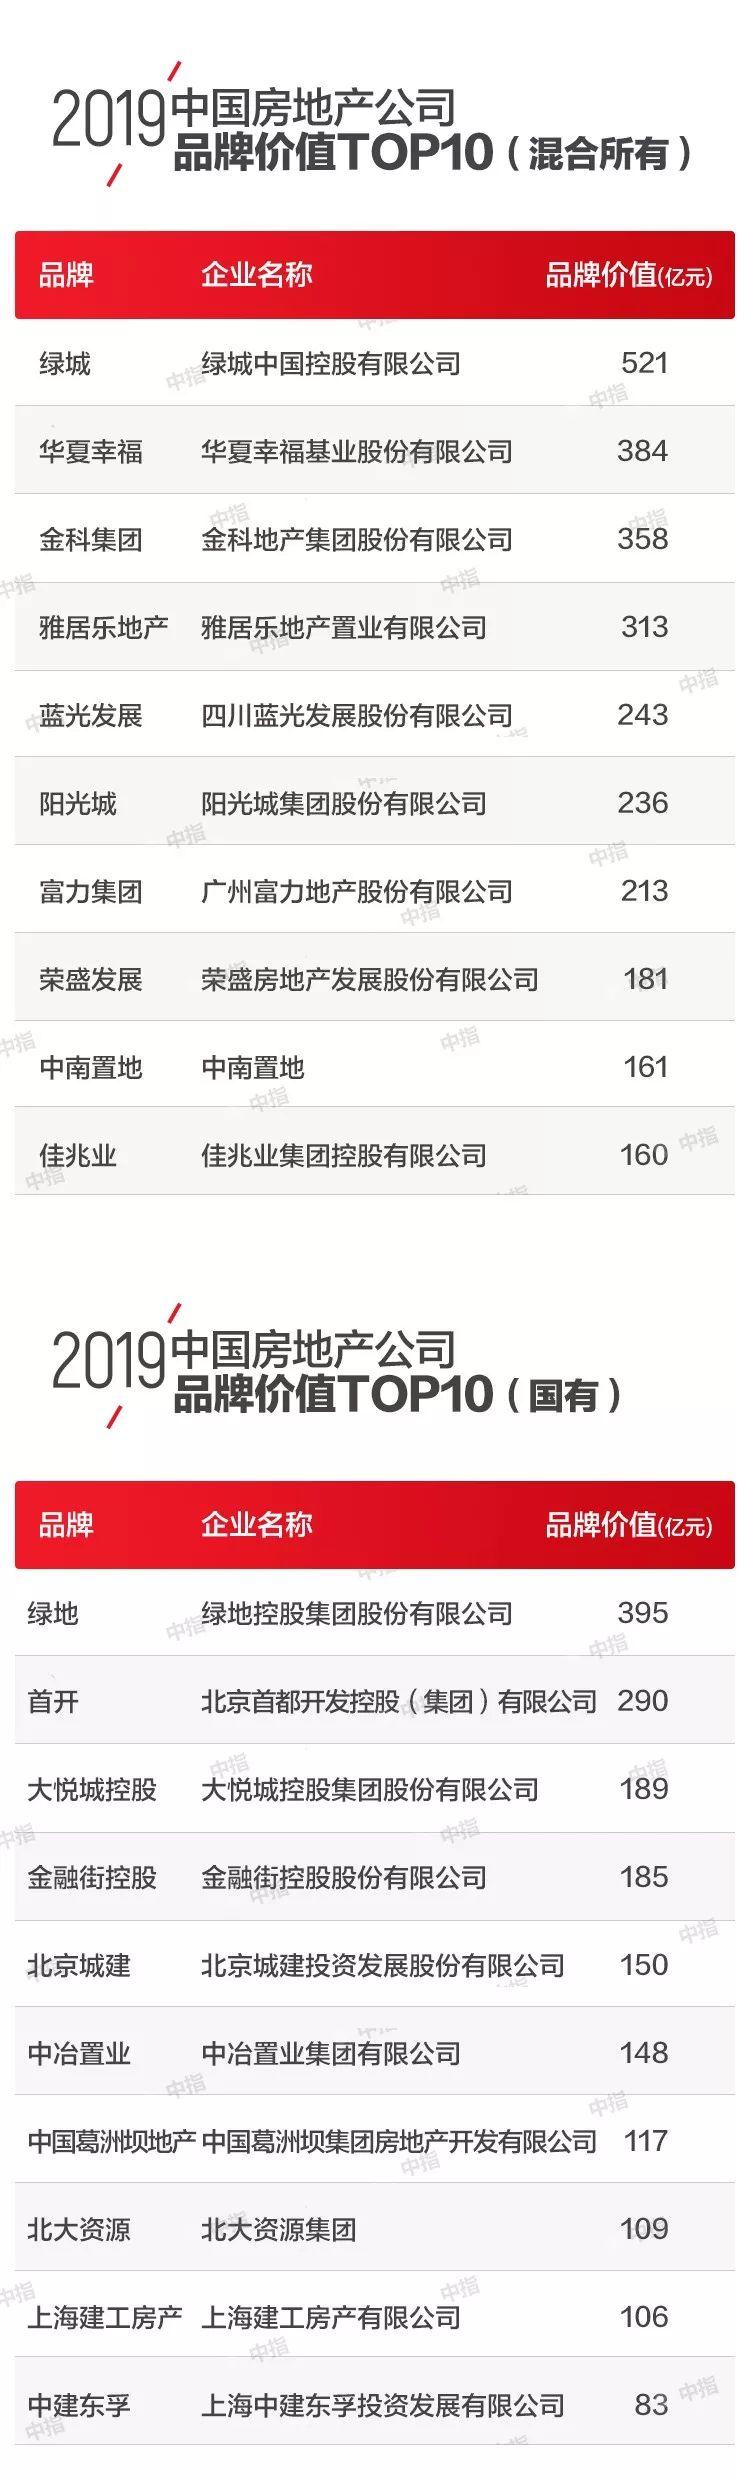 <b>2019中国房地产品牌价值TOP10排行榜_个人</b>